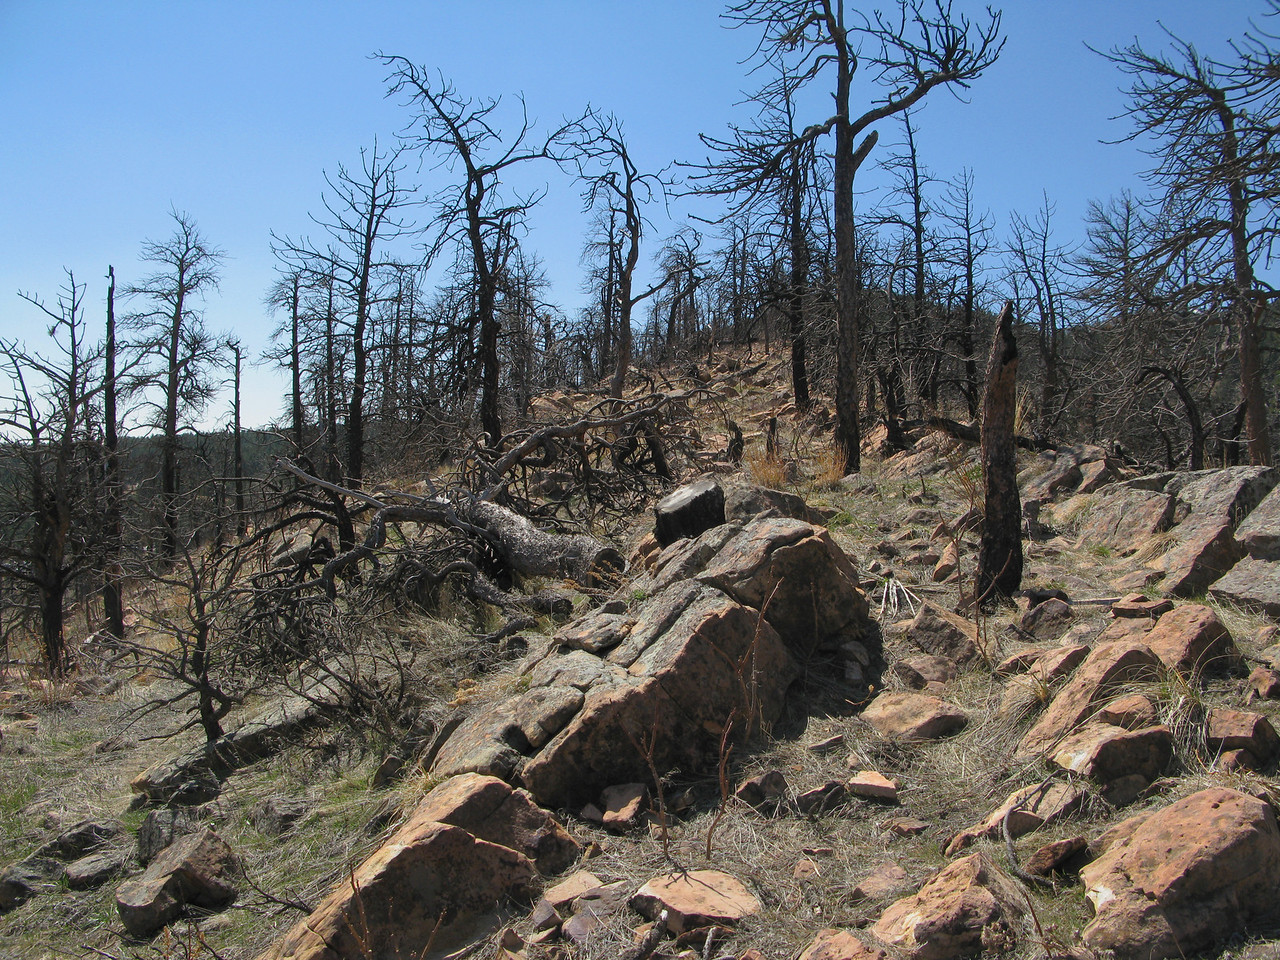 A few burned trees at the top of a ridge in El Dorado Springs, CO